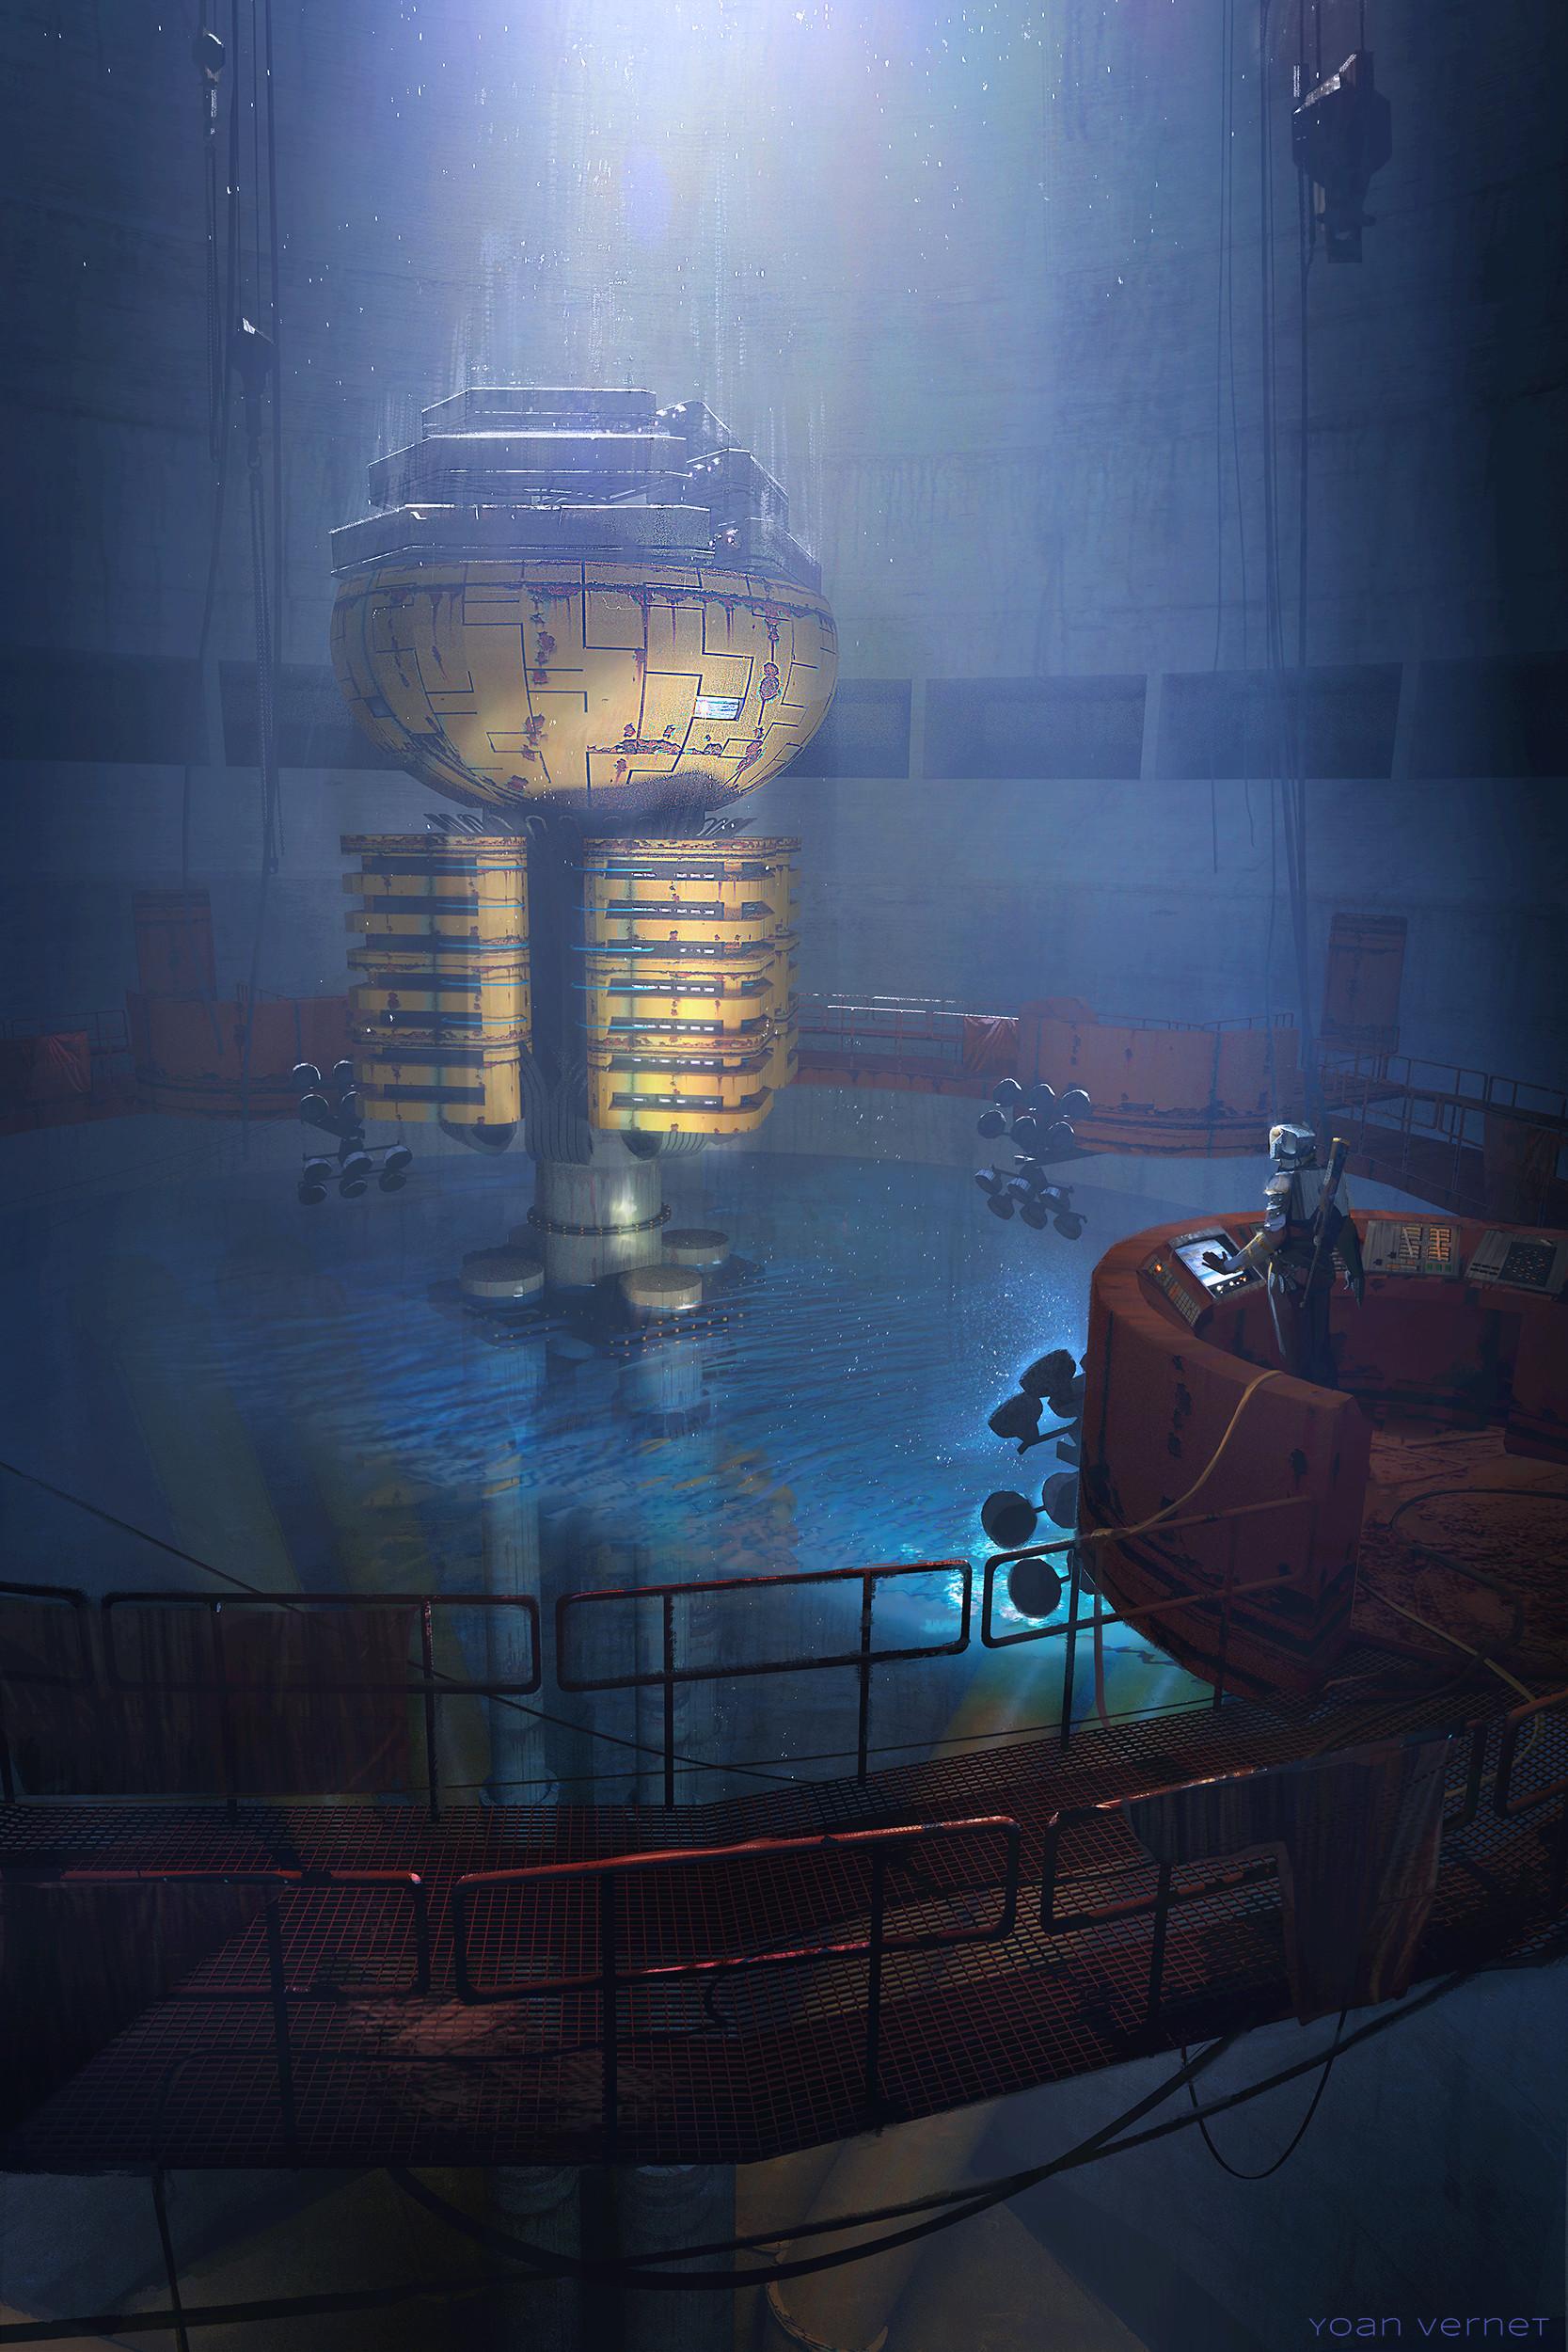 The Sci-Fi Concept Art of Yoan Vernet